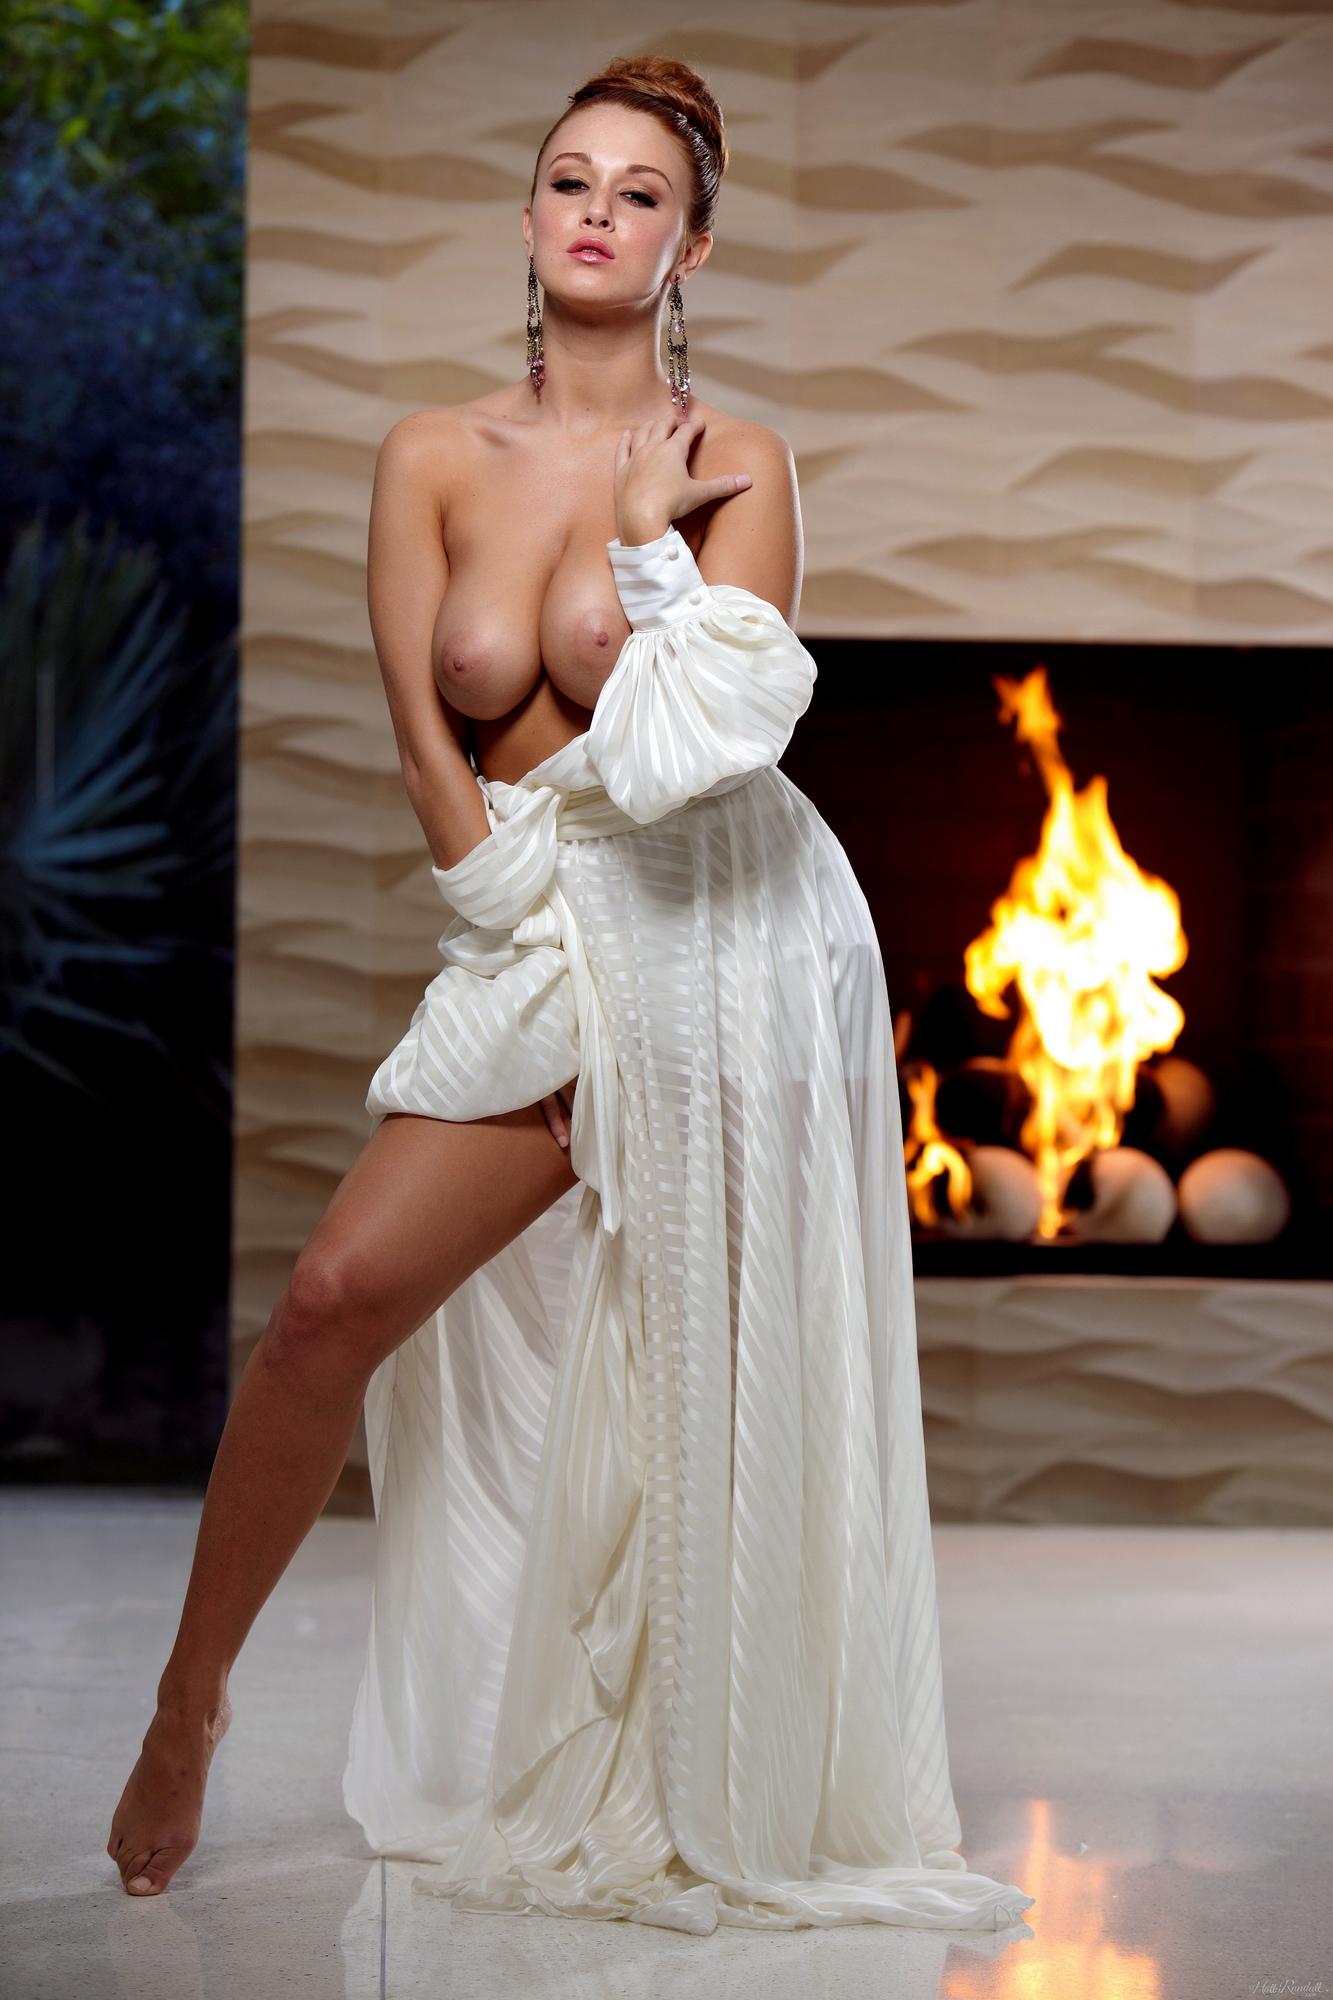 leanna-decker-nude-fireplace-redhead-hollyrandall-05